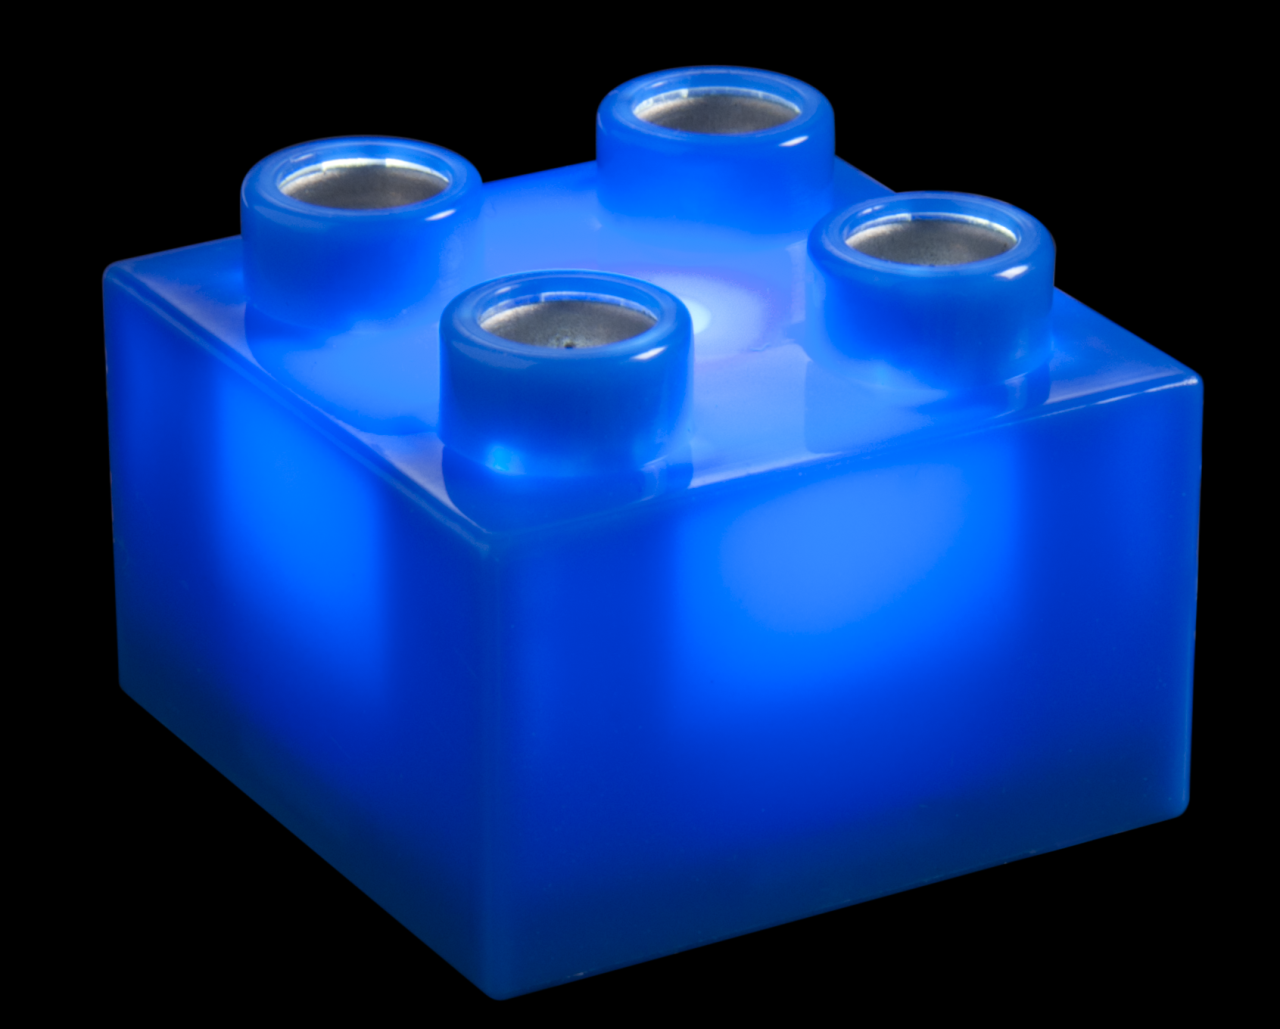 STAX® Expansion Pack 2x2 Blue - DUPLO®-kompatibel